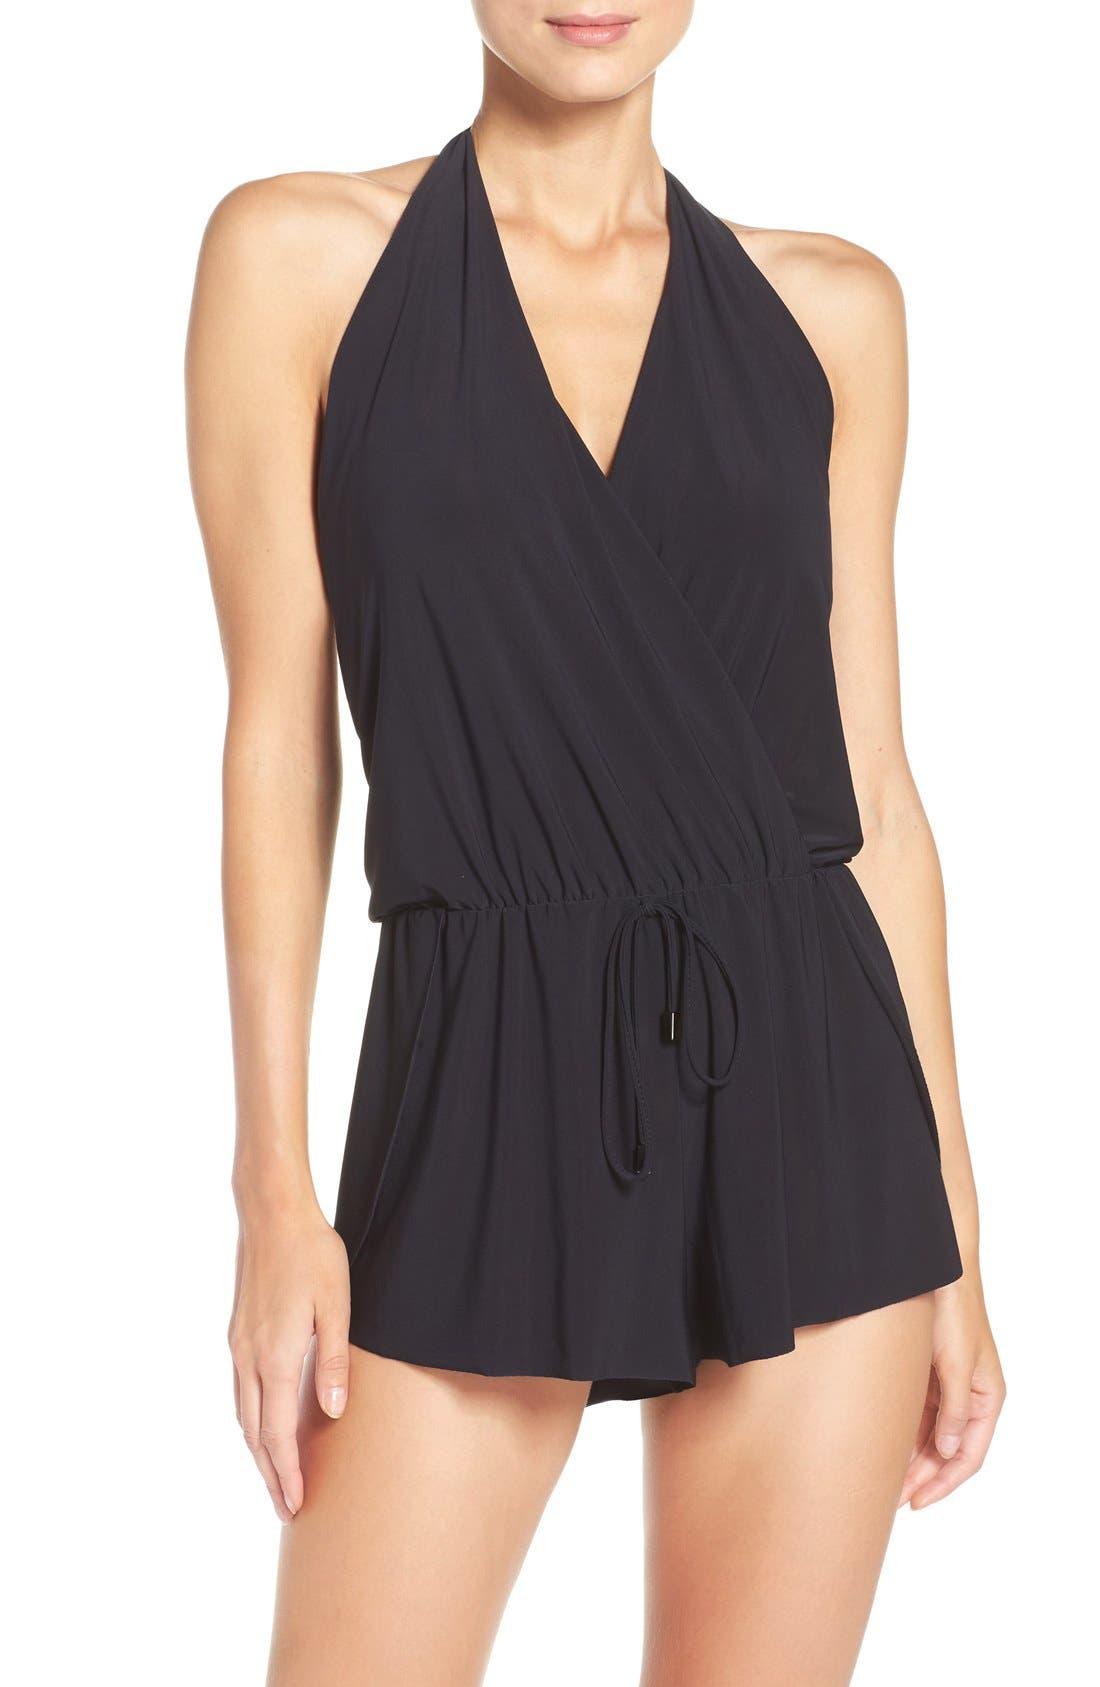 Magicsuit® Bianca One-Piece Swimsuit